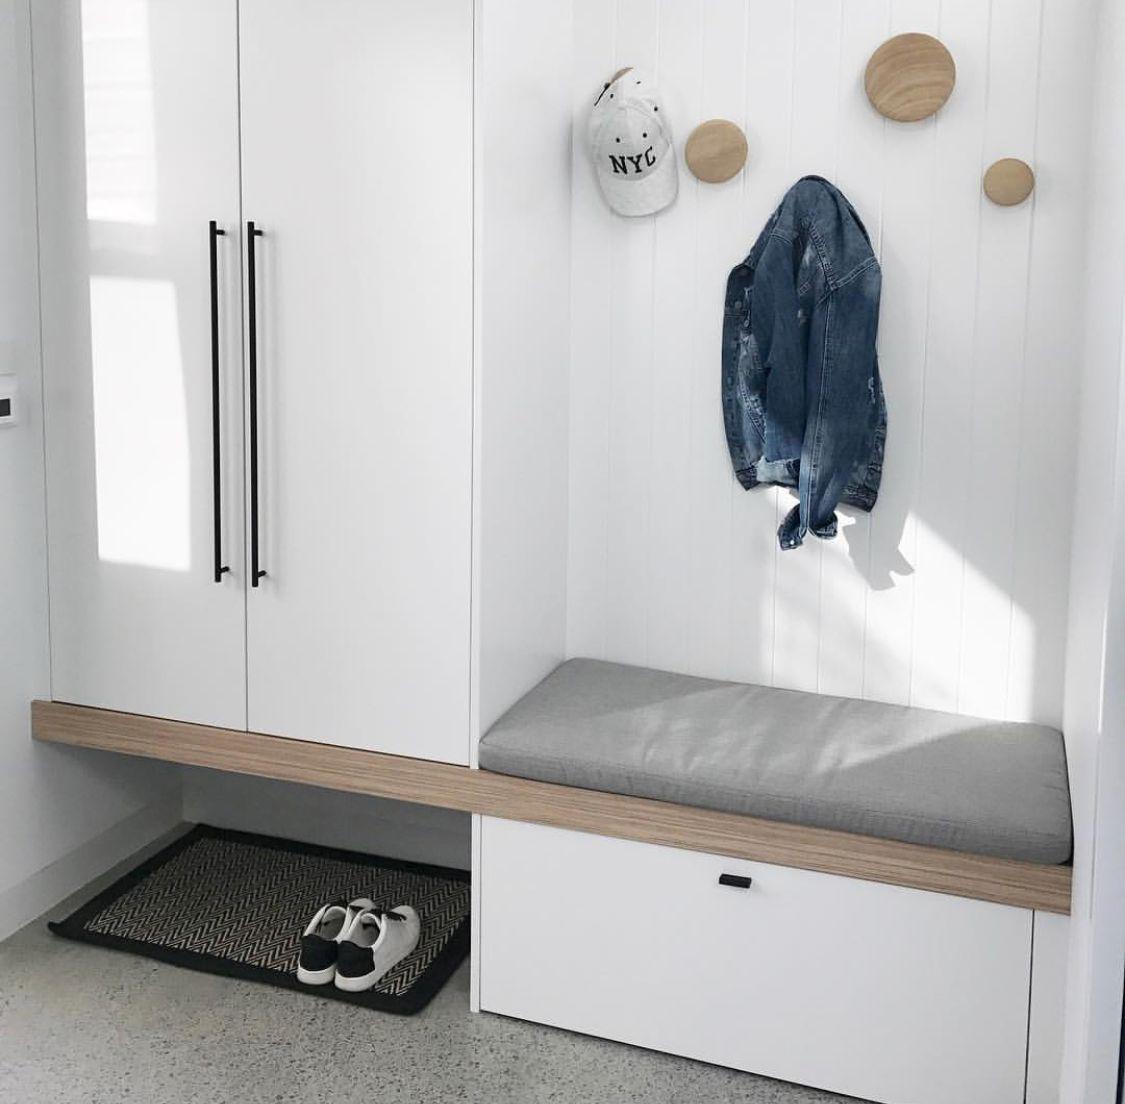 Hallway storage trunk  宿舍室內風格  宿舍室內空間  Pinterest  Foyers Mud rooms and Laundry